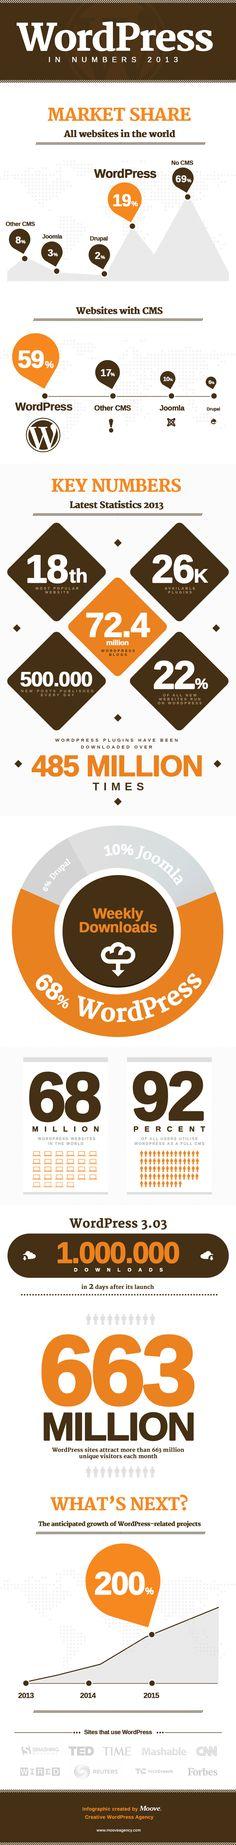 WordPress in Numbers 2013 #Infographic #wordpress #wordpress #wordpressthemes #wordpresstips